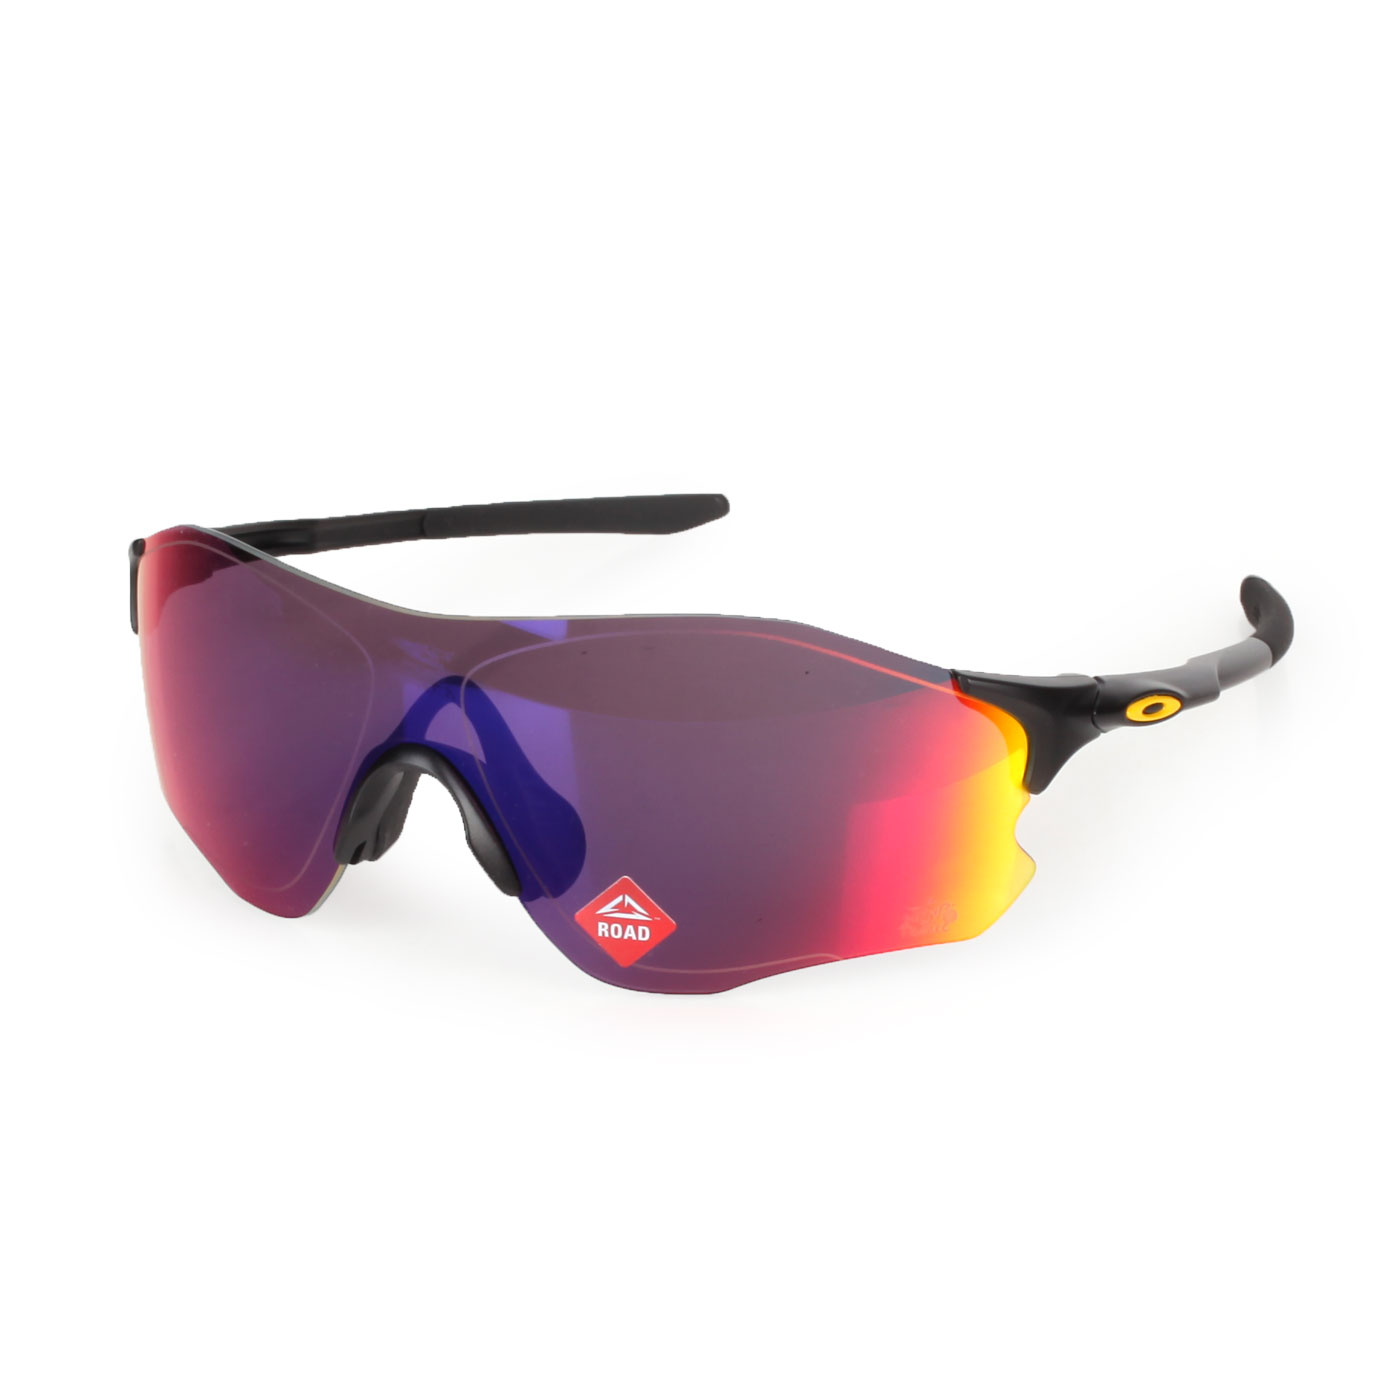 OAKLEY EVZERO PATH 一般太陽眼鏡(附硬盒鼻墊) OAK-OO9308-2438 - 黑黃